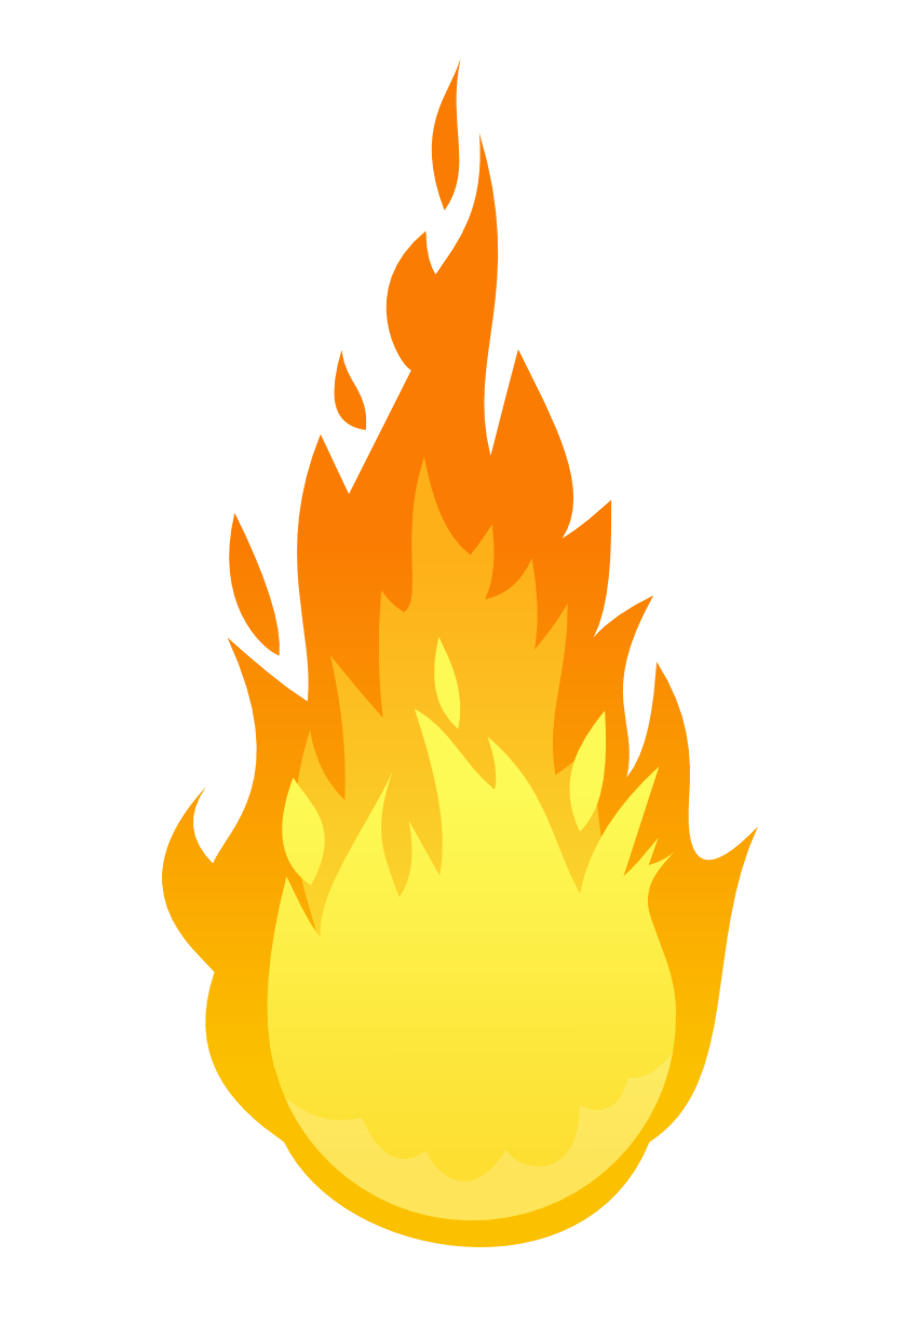 Transparent fire